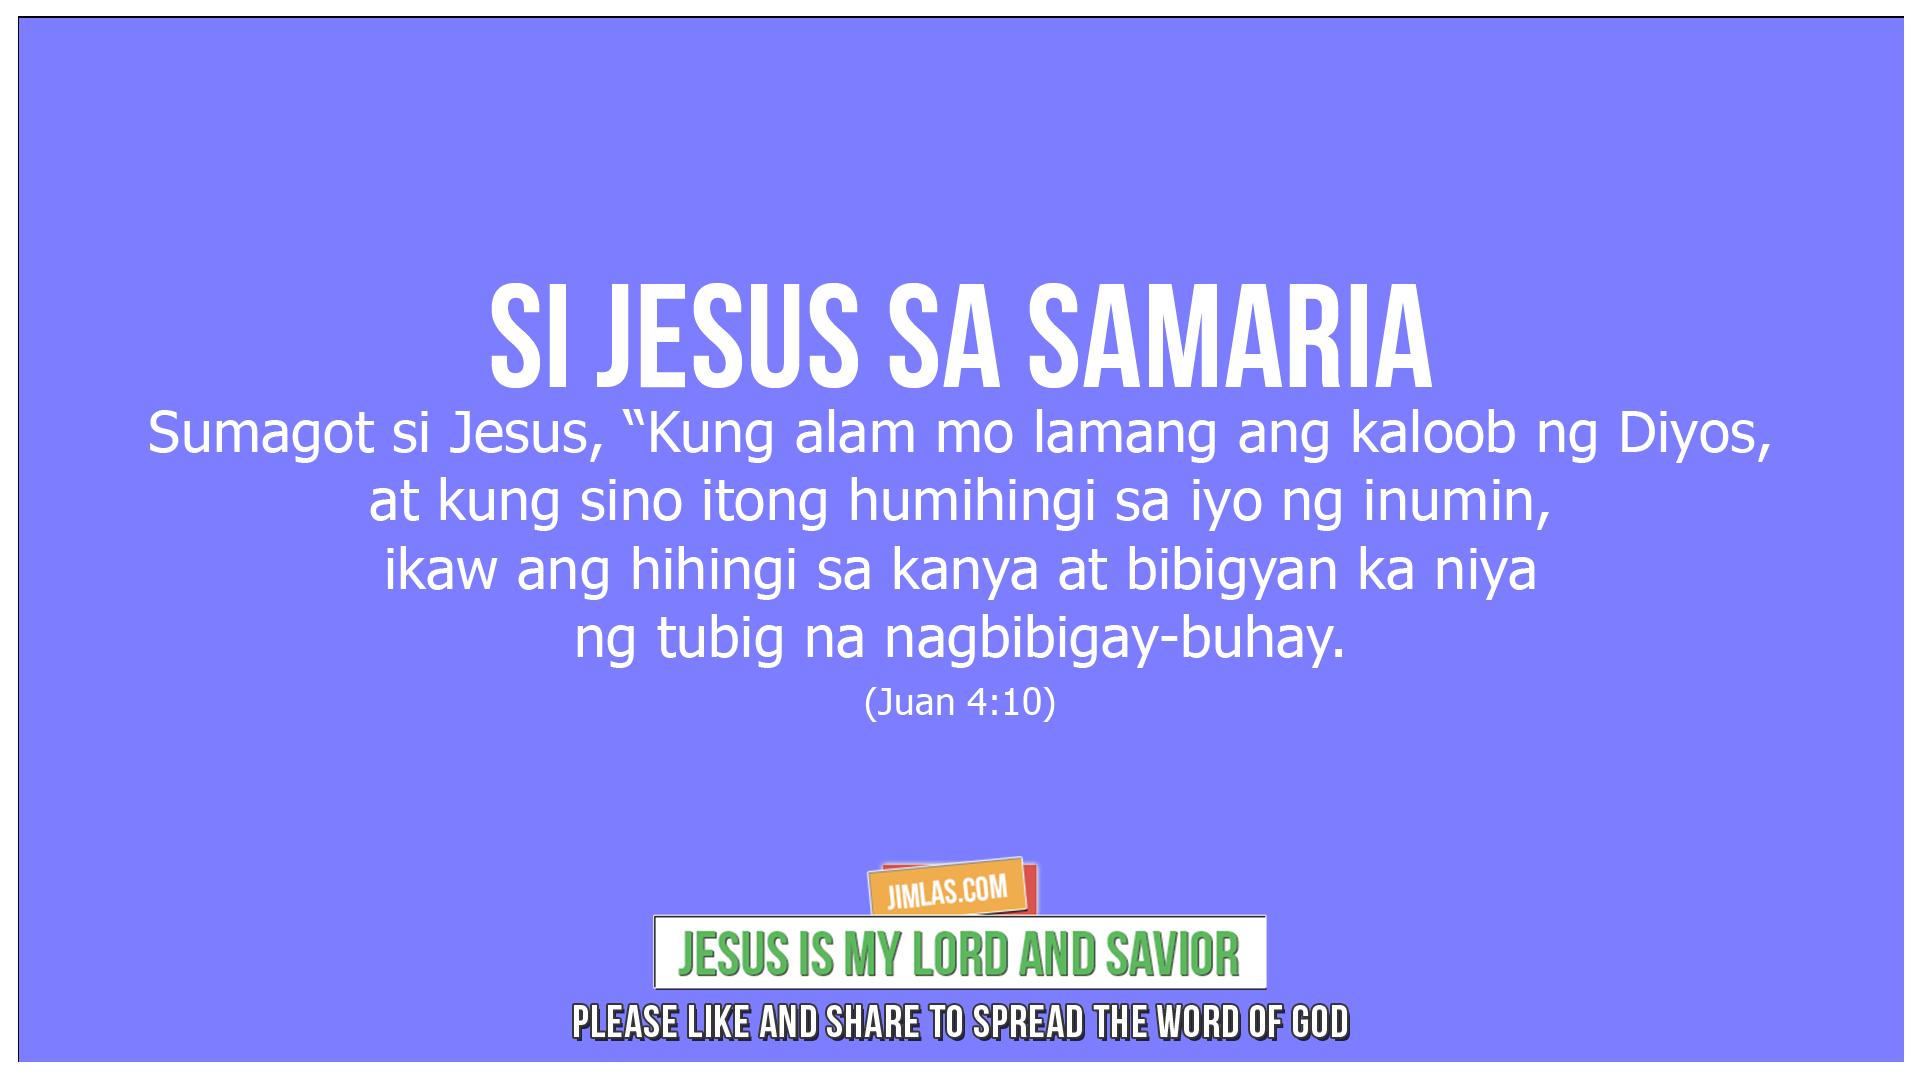 Juan 4 10, Juan 4:10